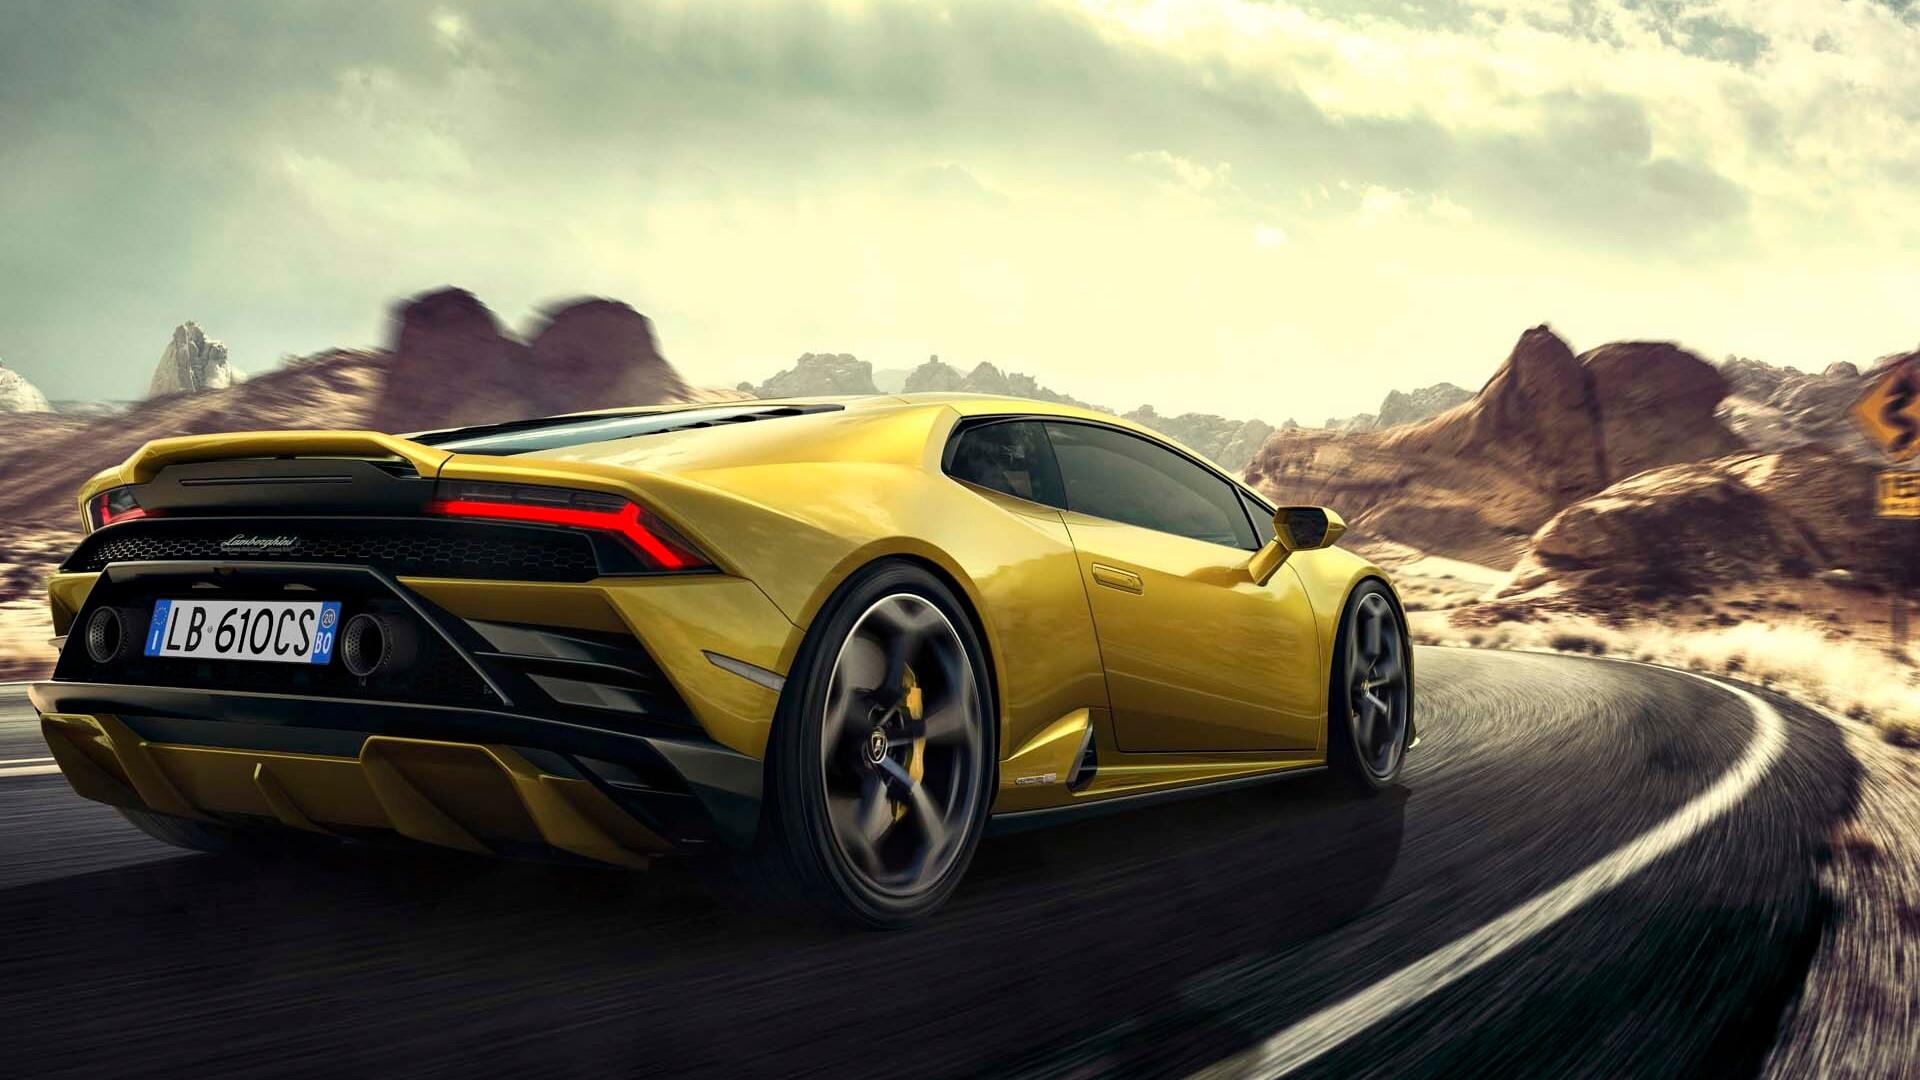 Rear-wheel-drive Lamborghini Huracan Evo